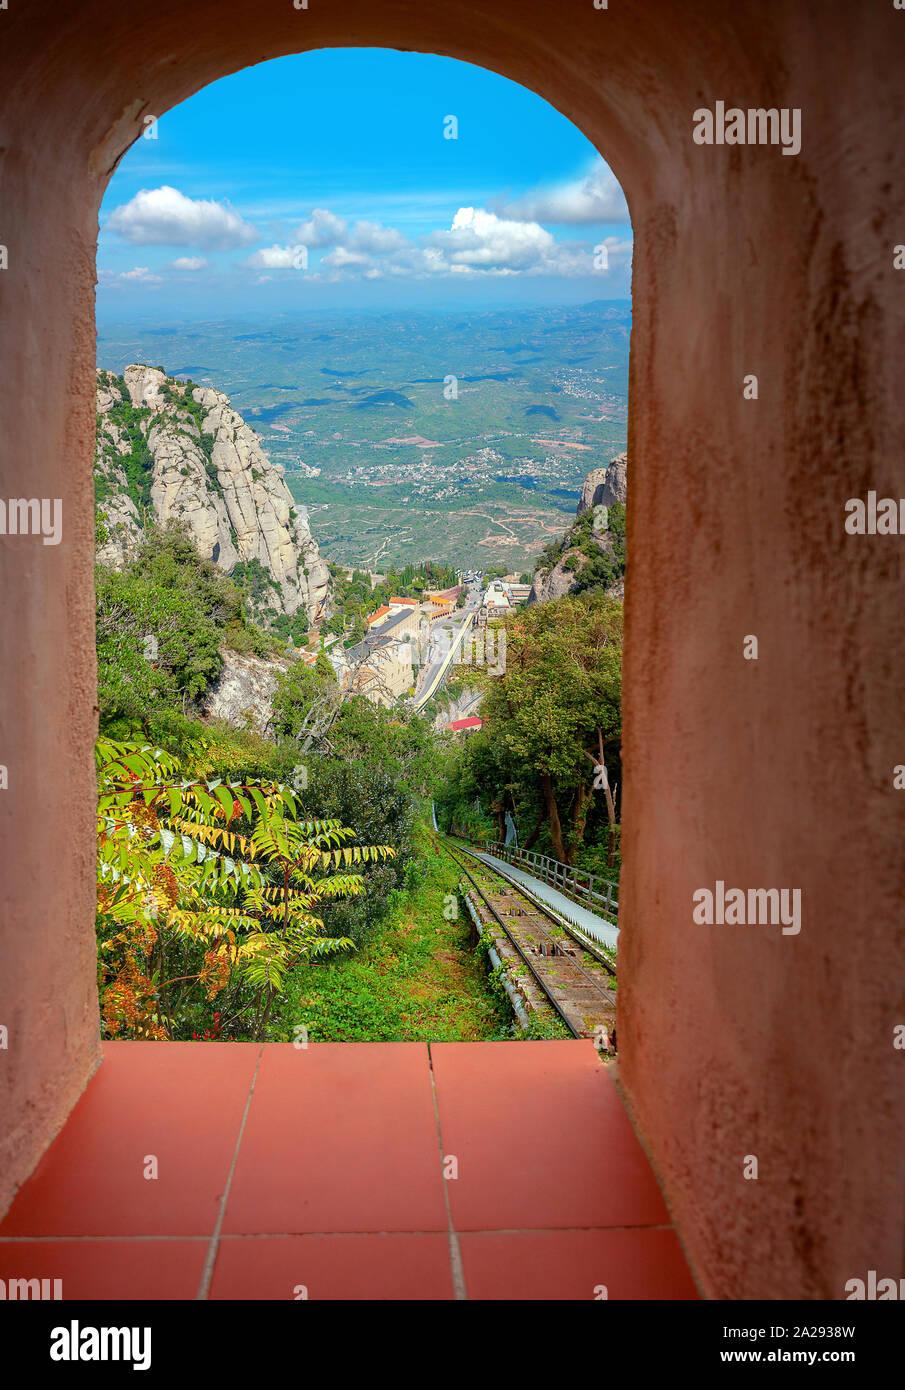 Picturesque view through window on famous monastery Santa Maria de Montserrat located in mountains. Catalonia, Spain Stock Photo